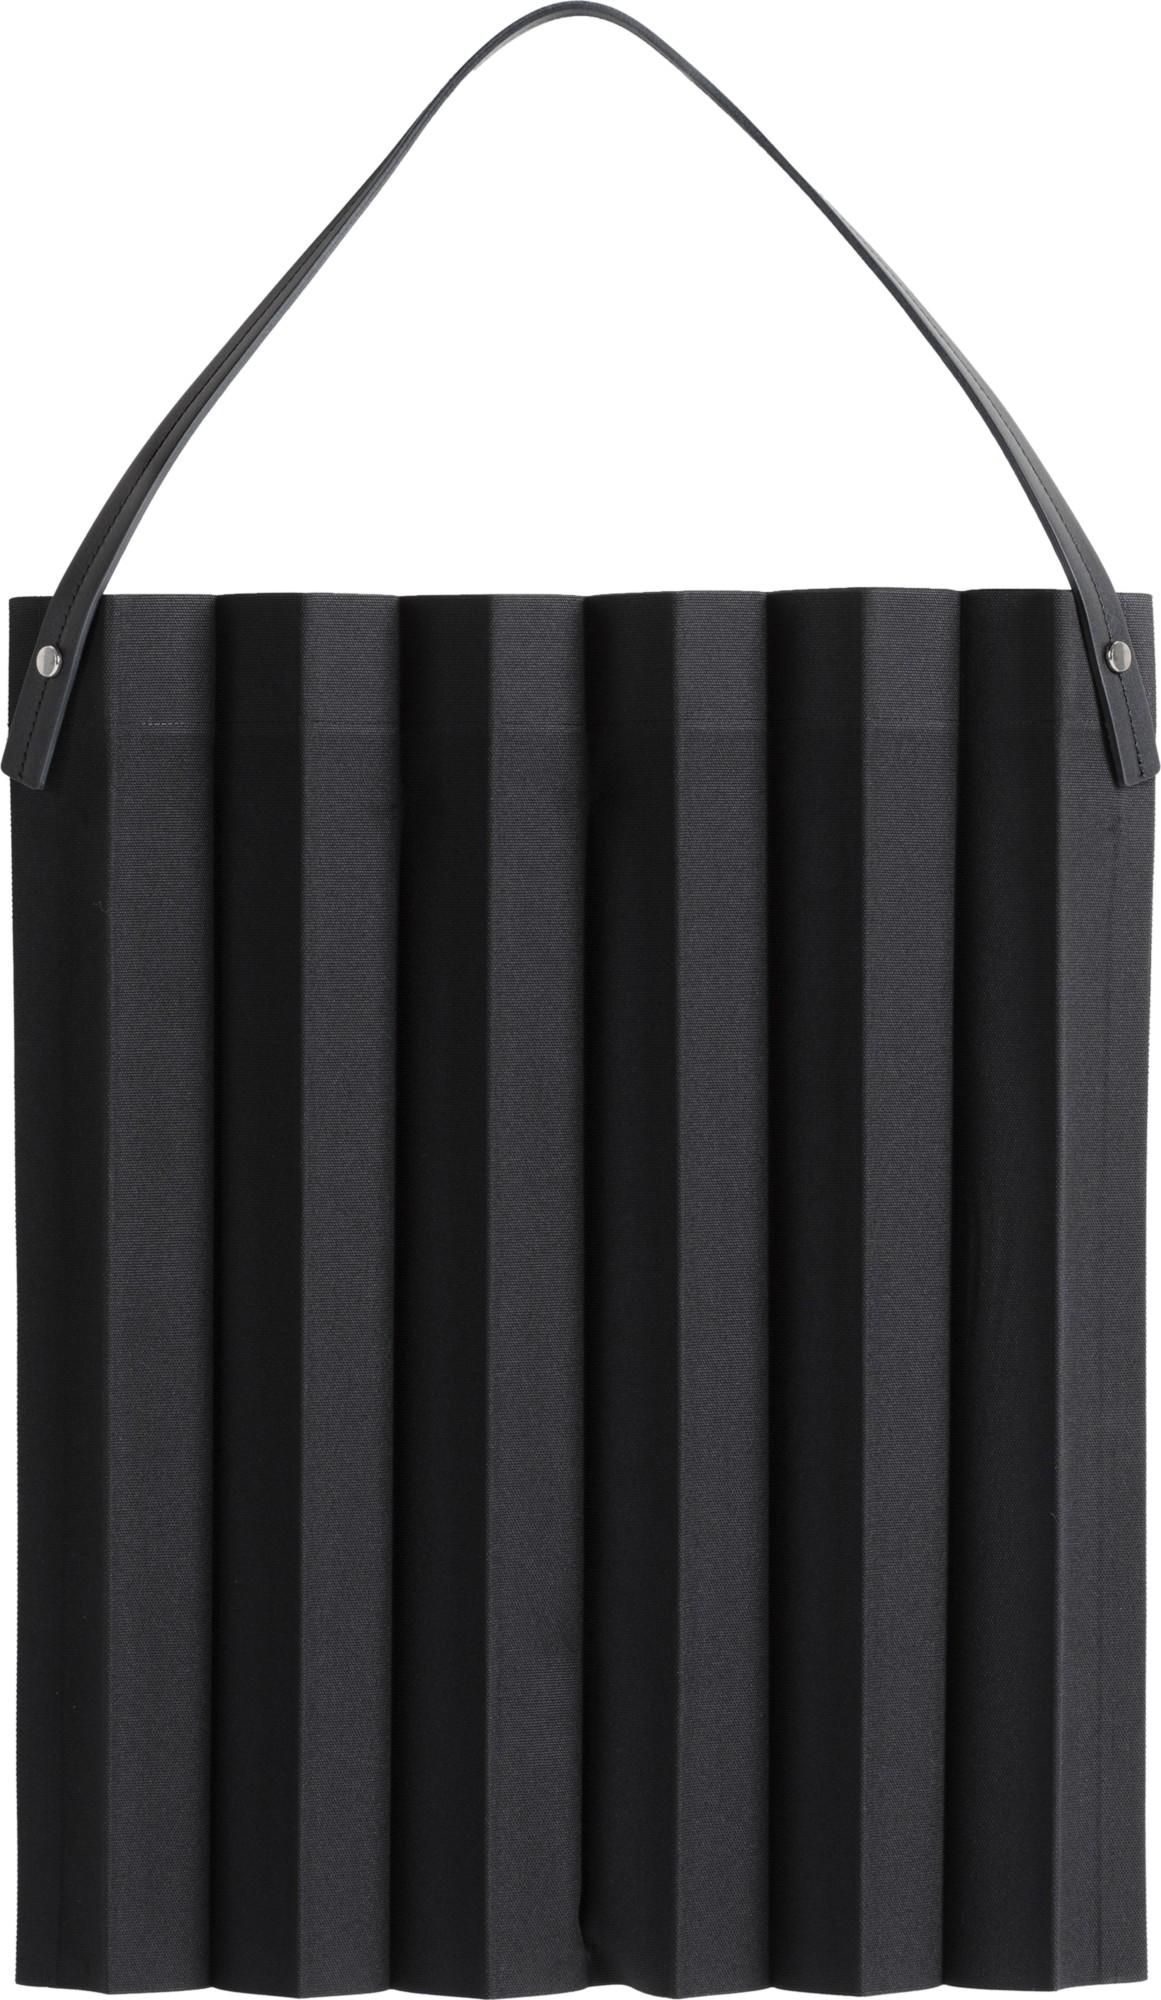 1554970b48 Iittala - Iittala X Issey Miyake bag 49 x 44 cm black - Iittala.com UK